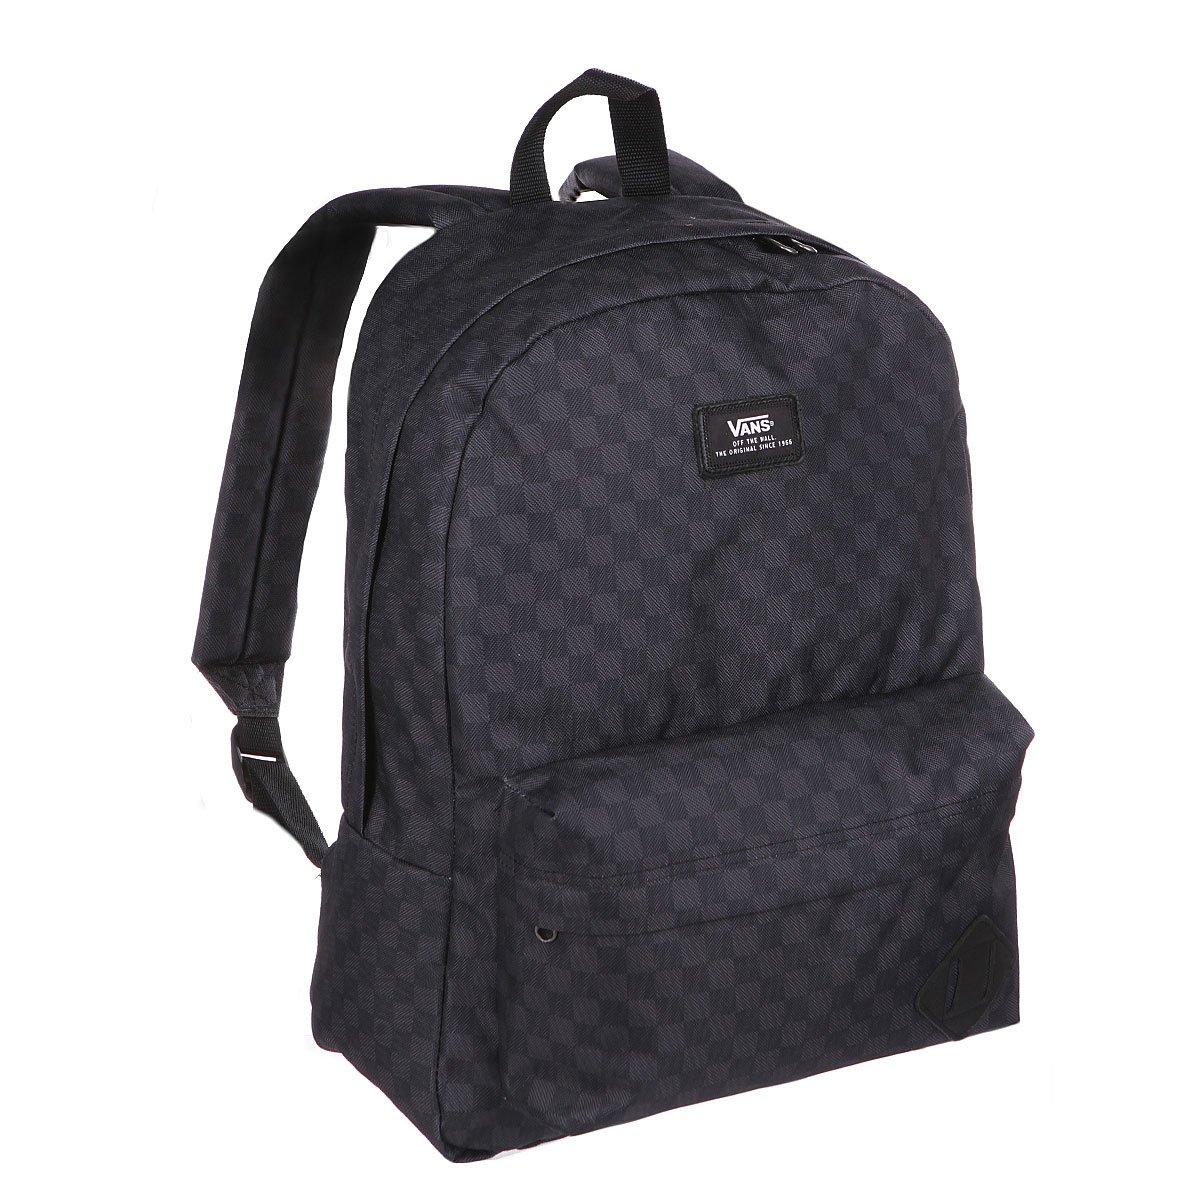 c32398de8739 Купить рюкзак городской Vans Old Skool Ii Backpack Black/Charcoal в ...